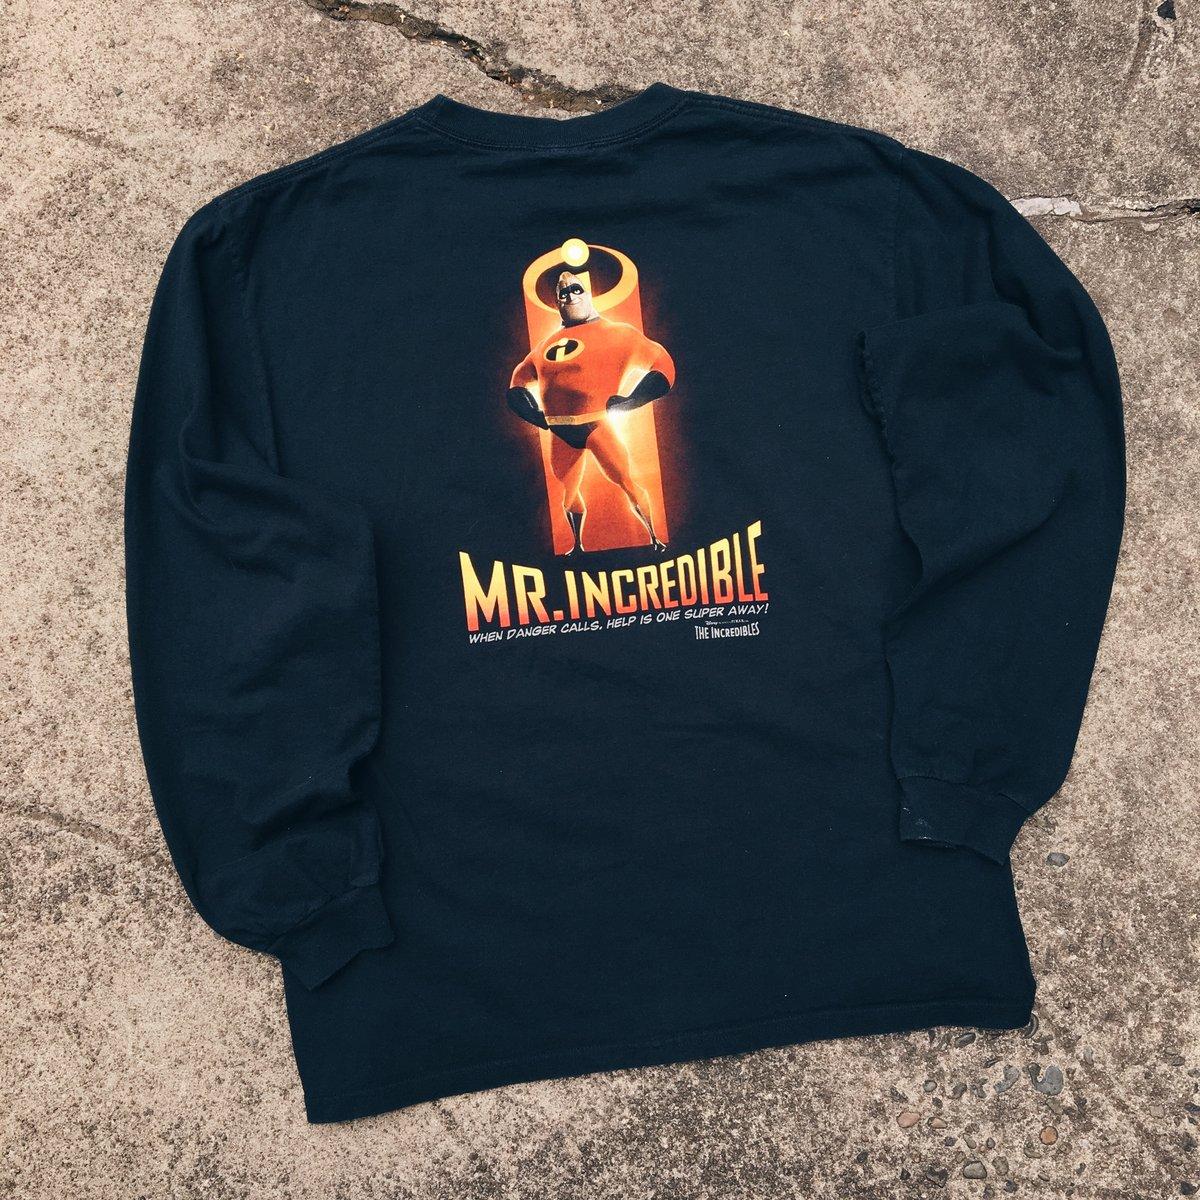 Image of Original 2004 Disney The Incredibles Movie Tee.